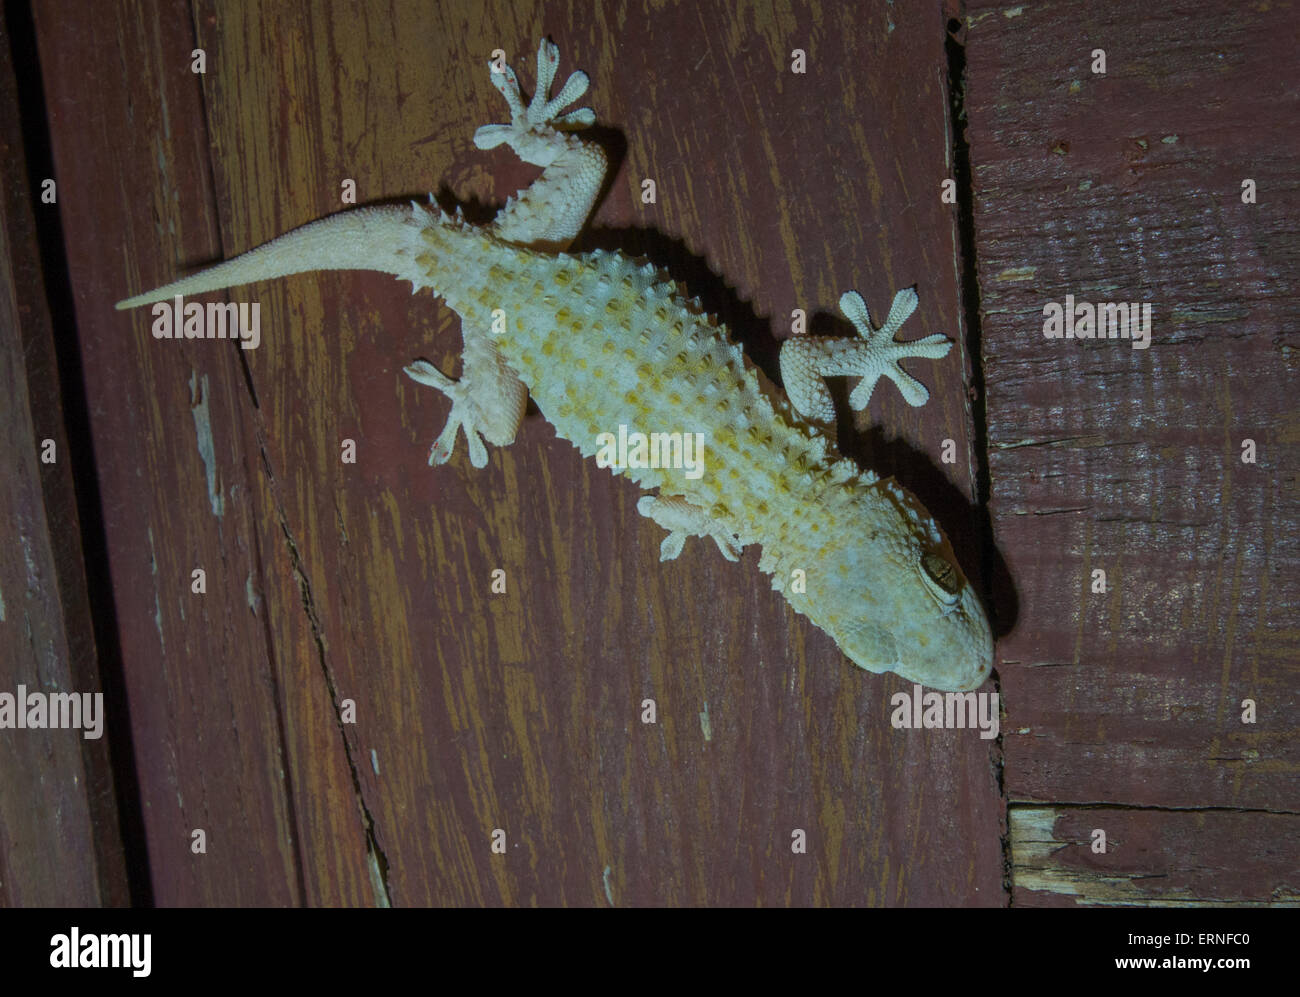 Close Up Mediterranean House Gecko Hemidactylus Turcicus From